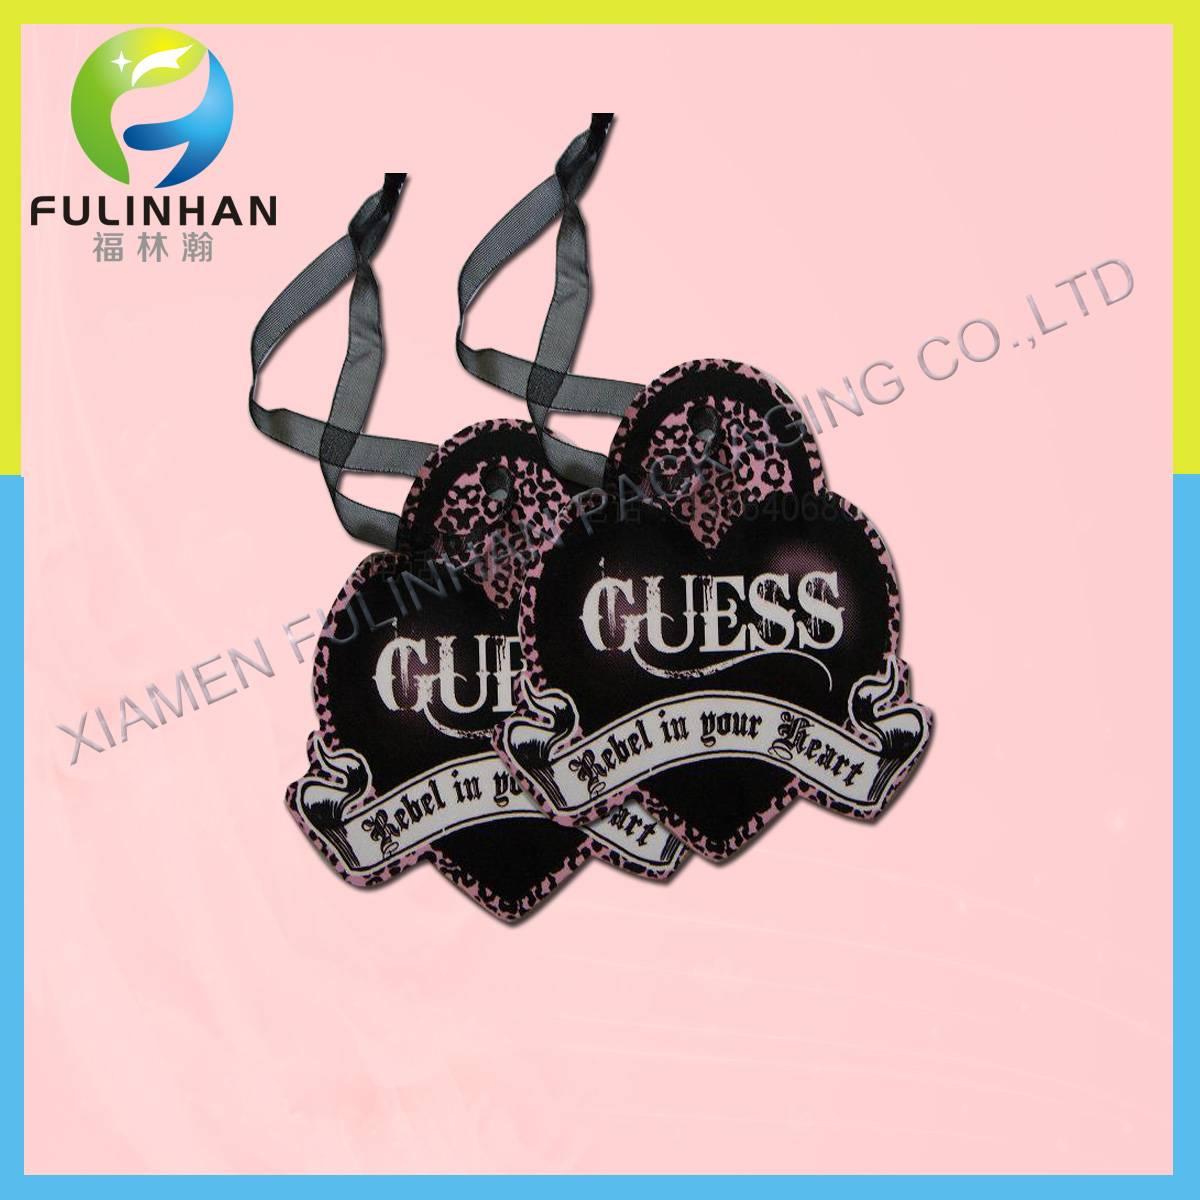 Custom clothing hangtags